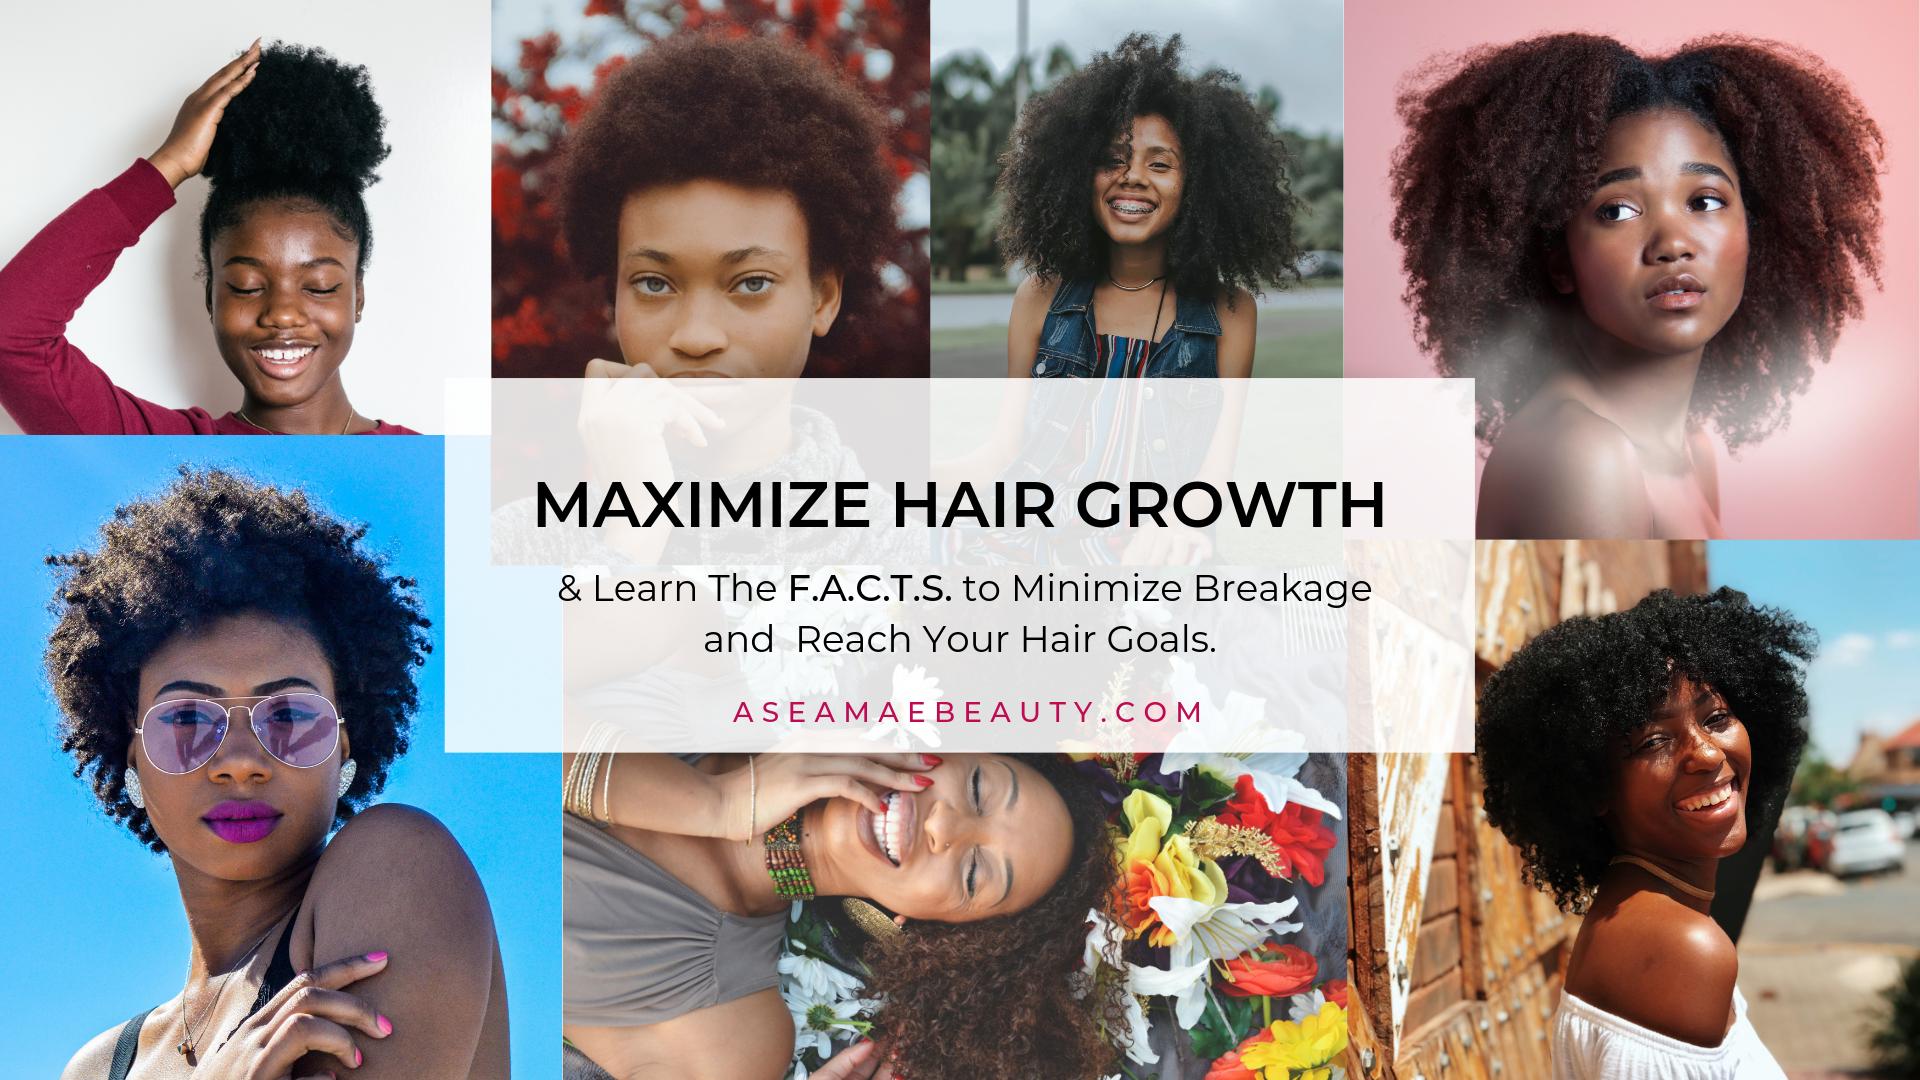 Maximize Hair Growth Final Photo.png